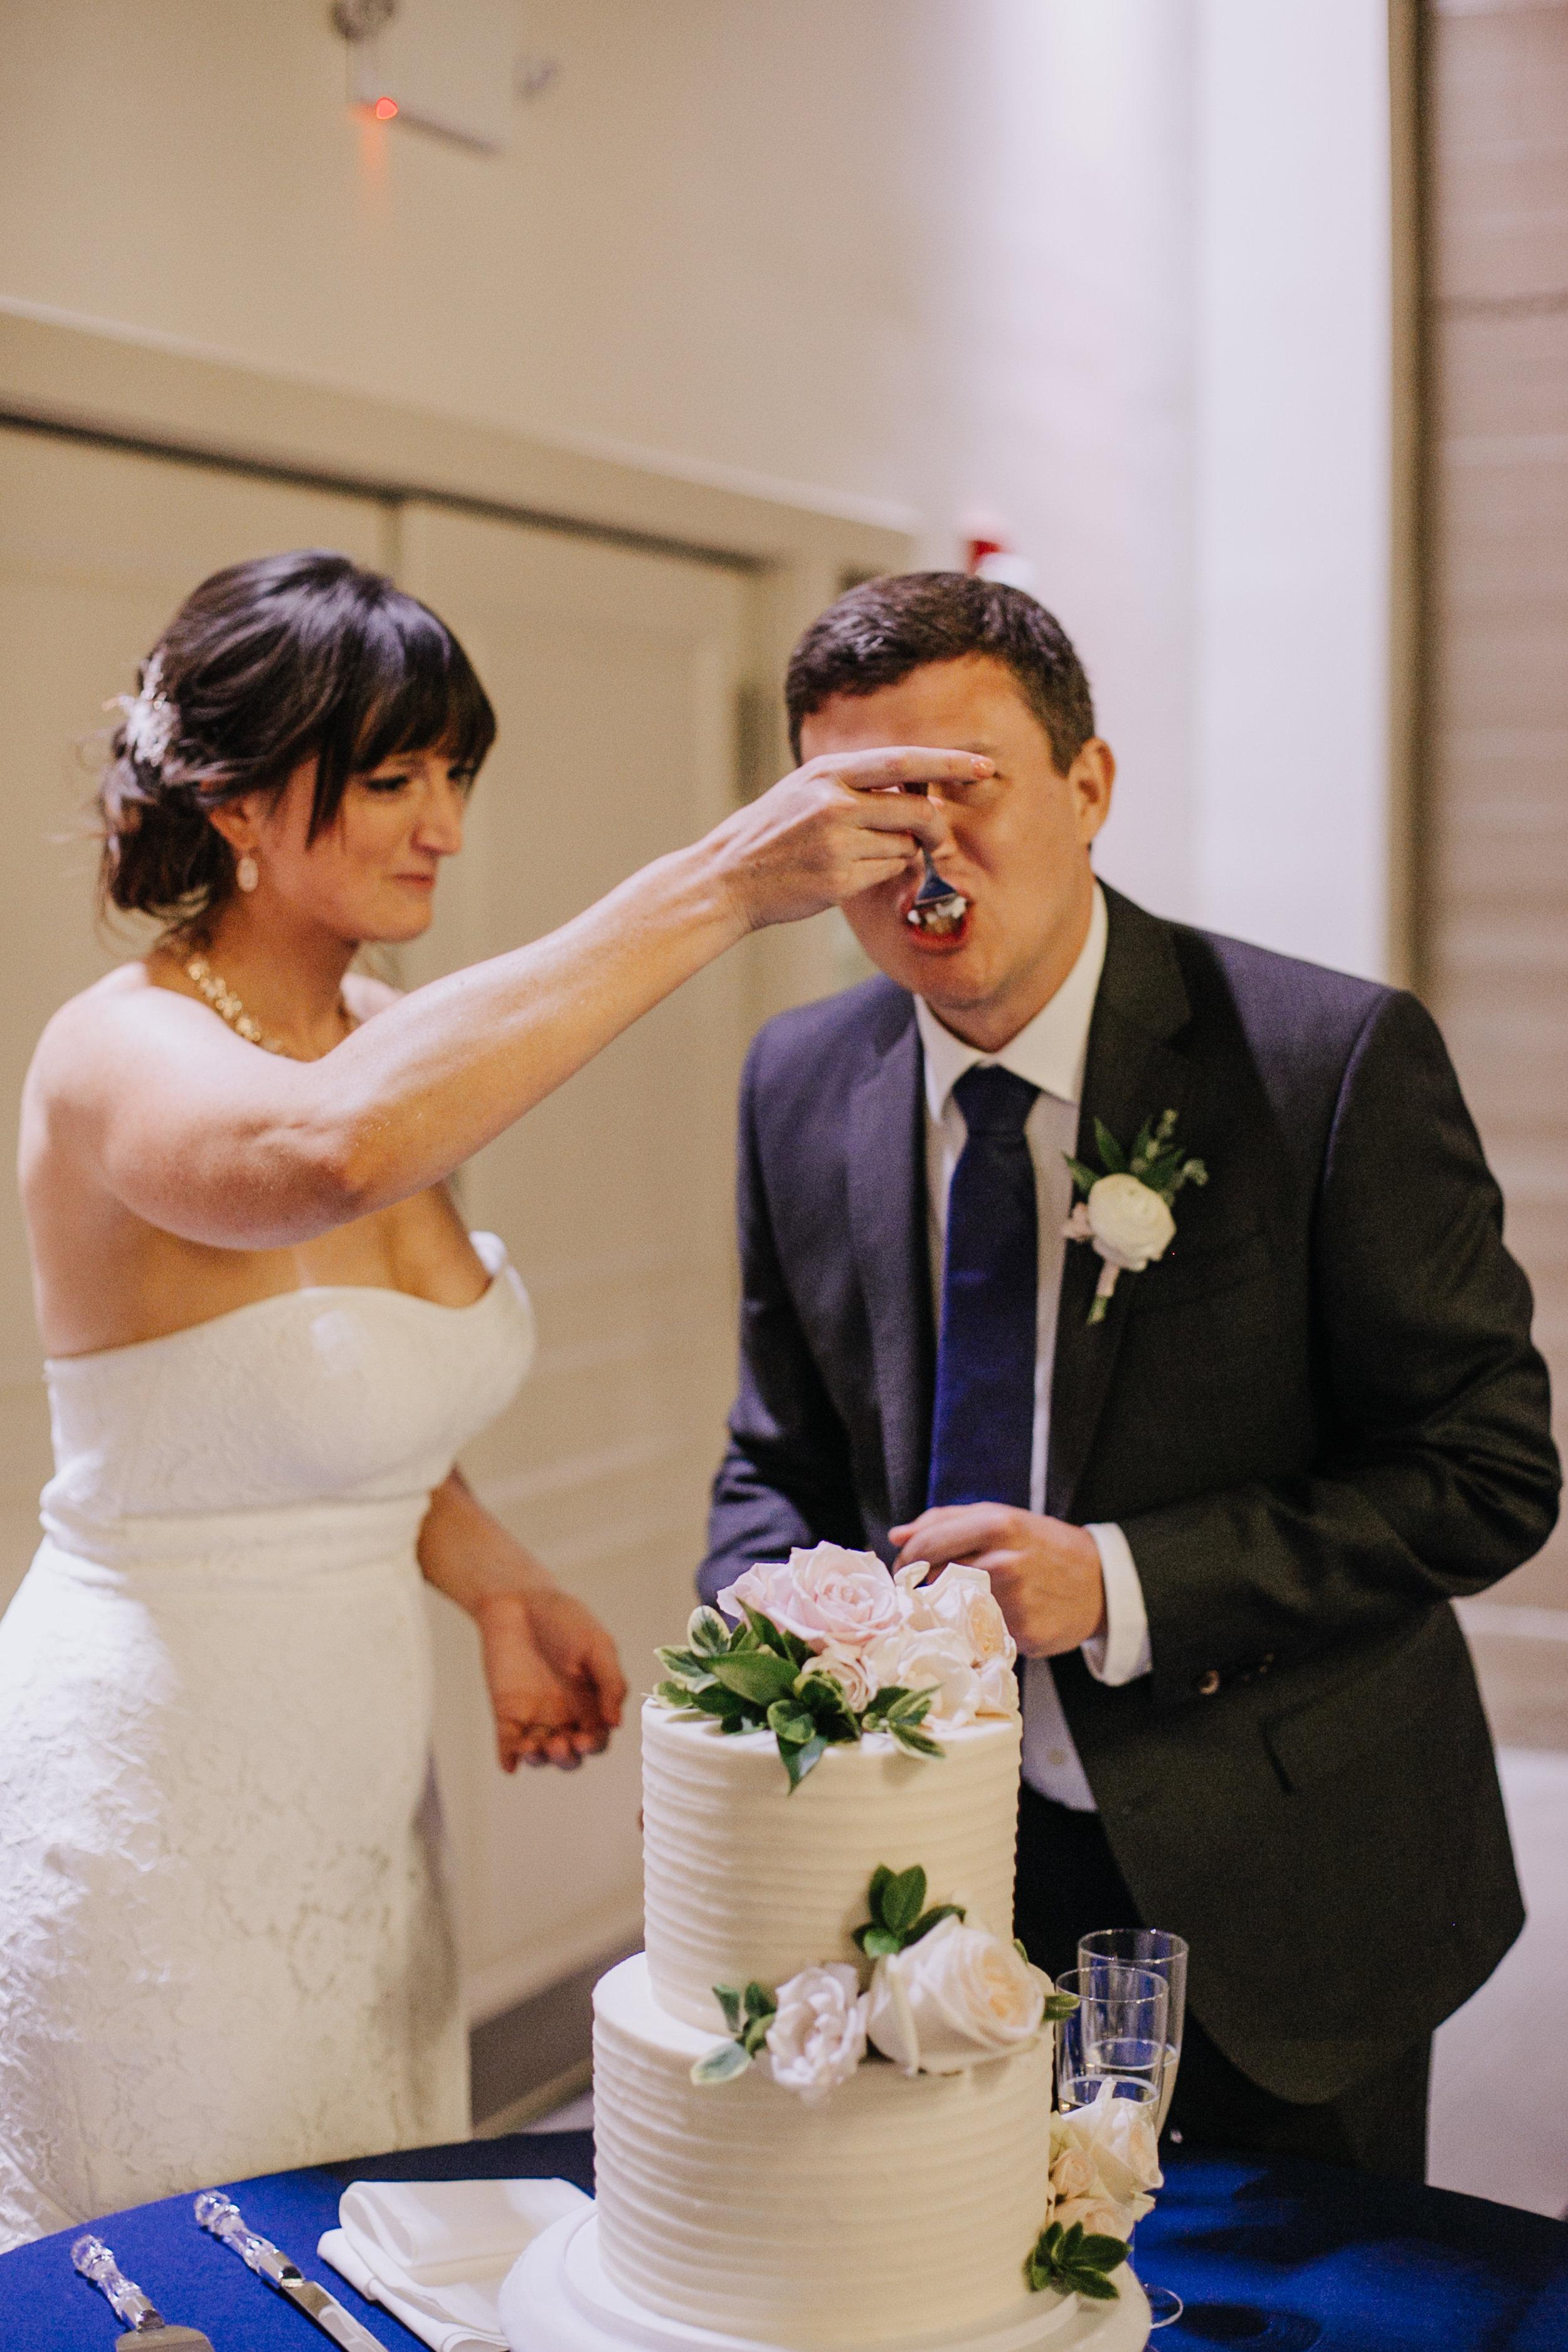 matthews-wedding-568.jpg